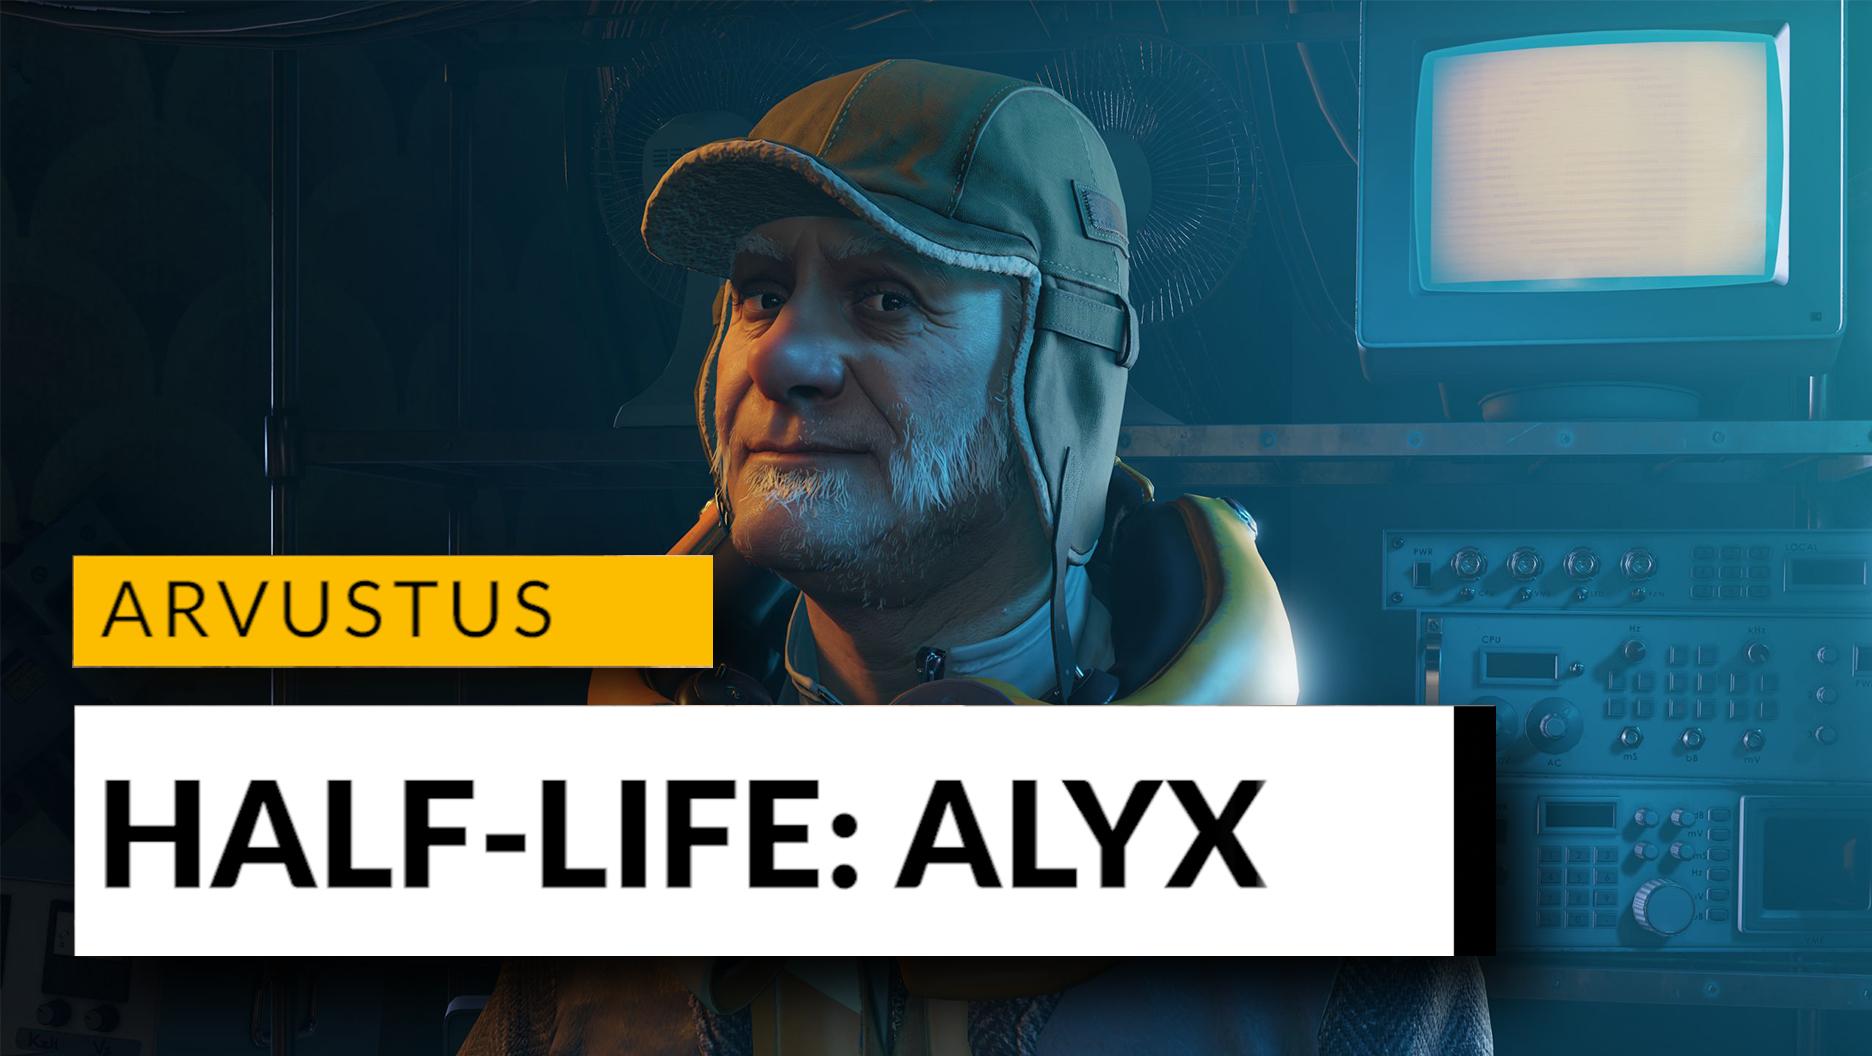 https://mabrik.ee/wp-content/uploads/2020/04/Half-Life-Alyx-promopilt.jpg